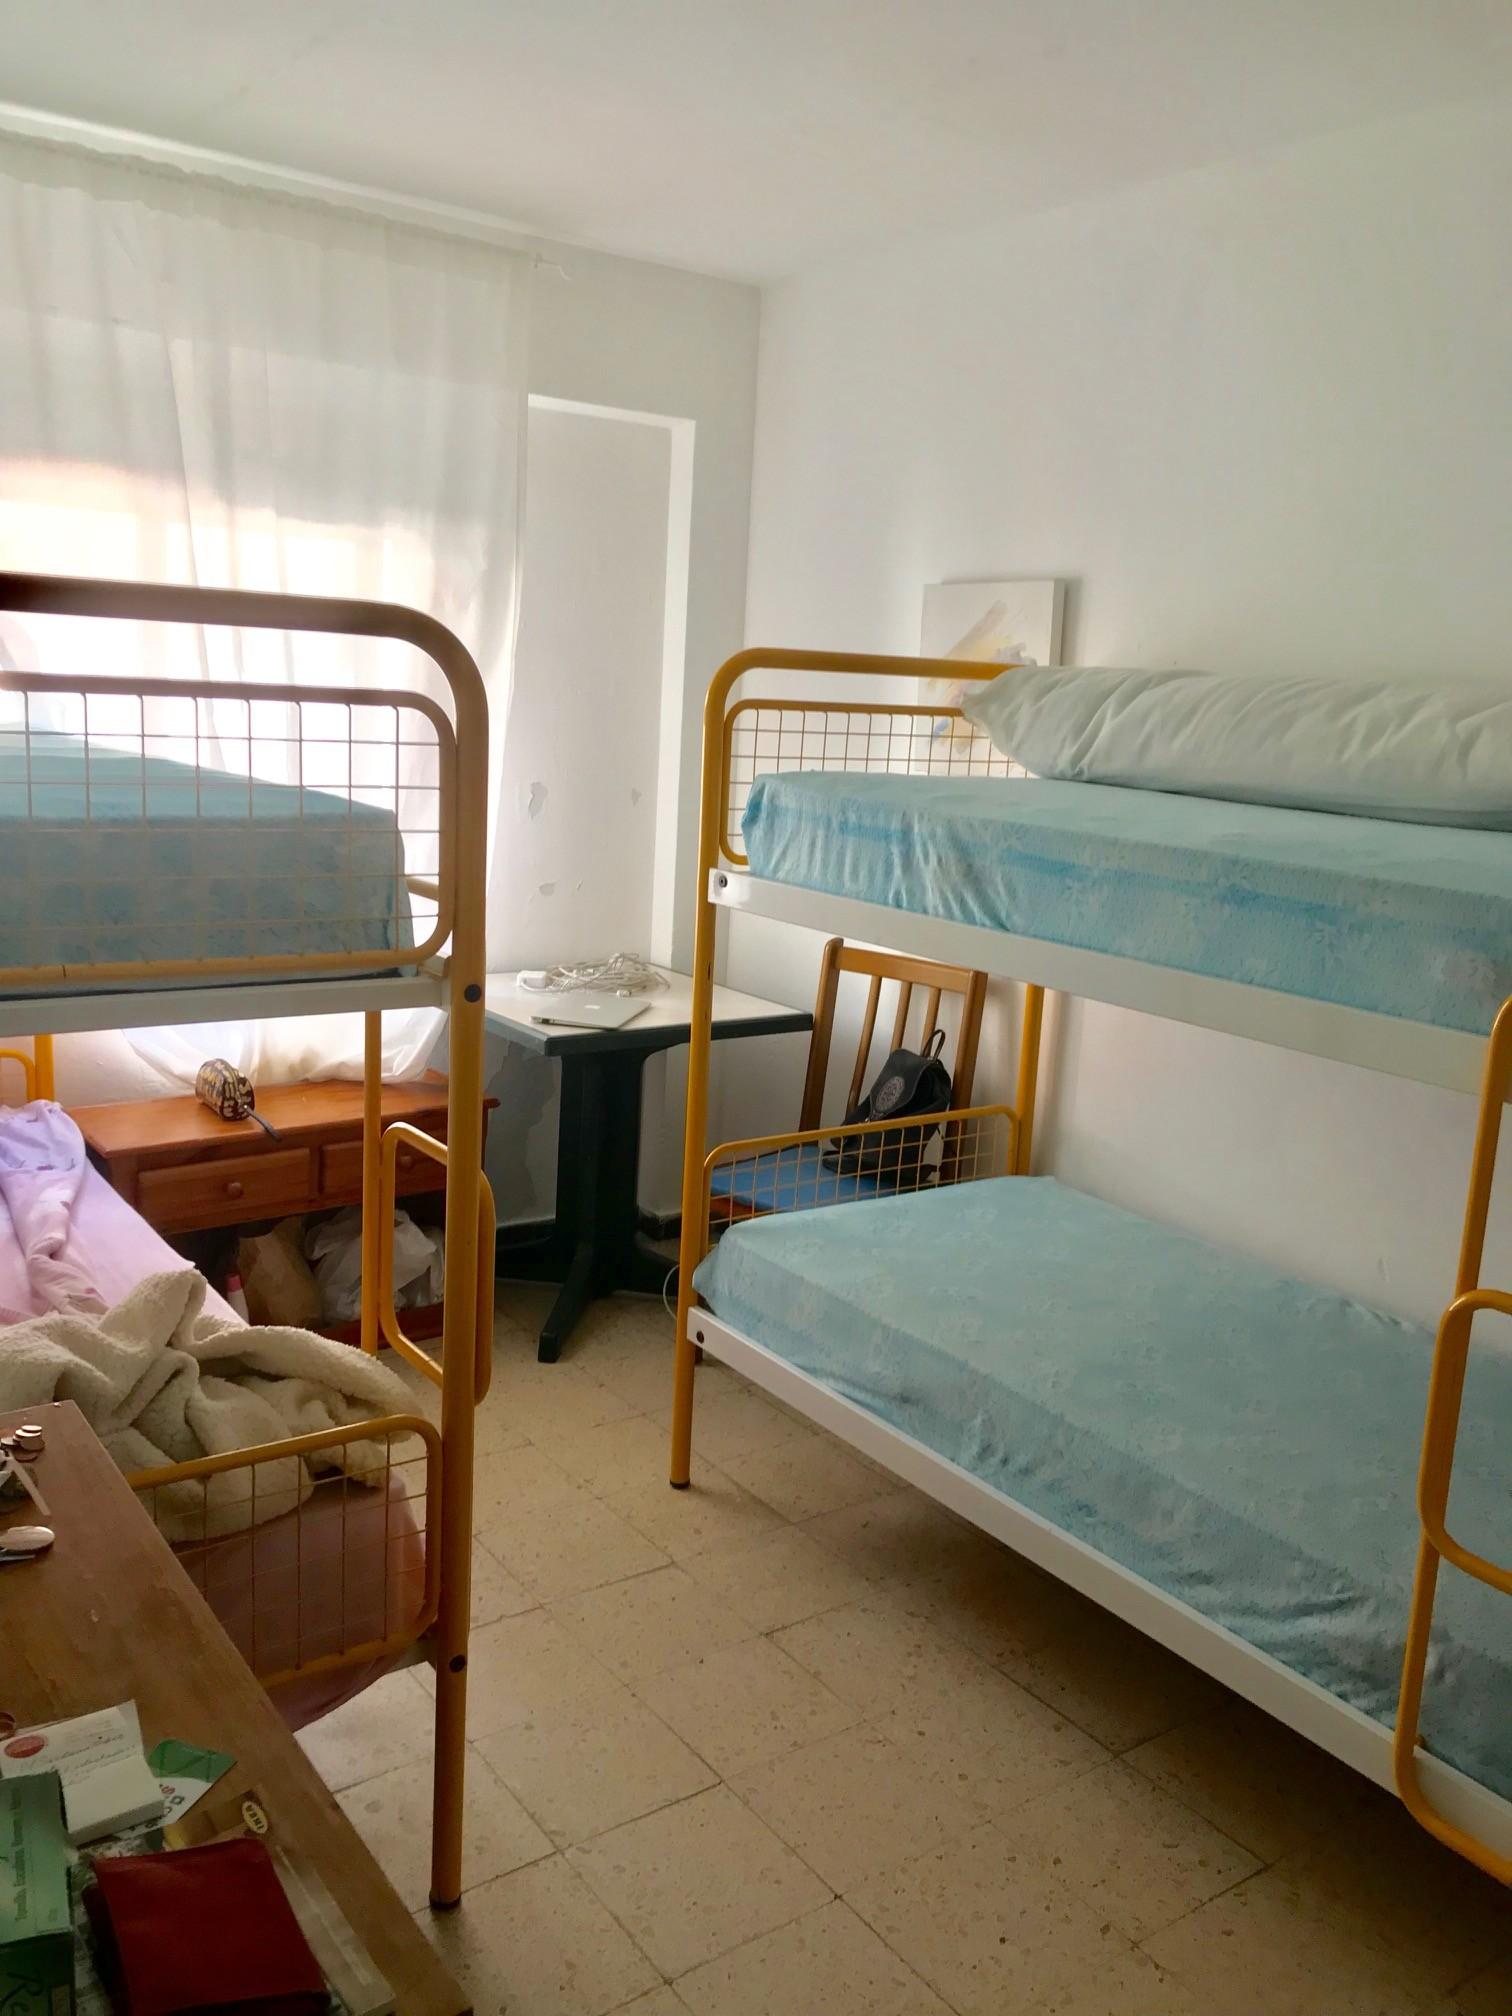 Pineda, camas en mini residencia estudiantes